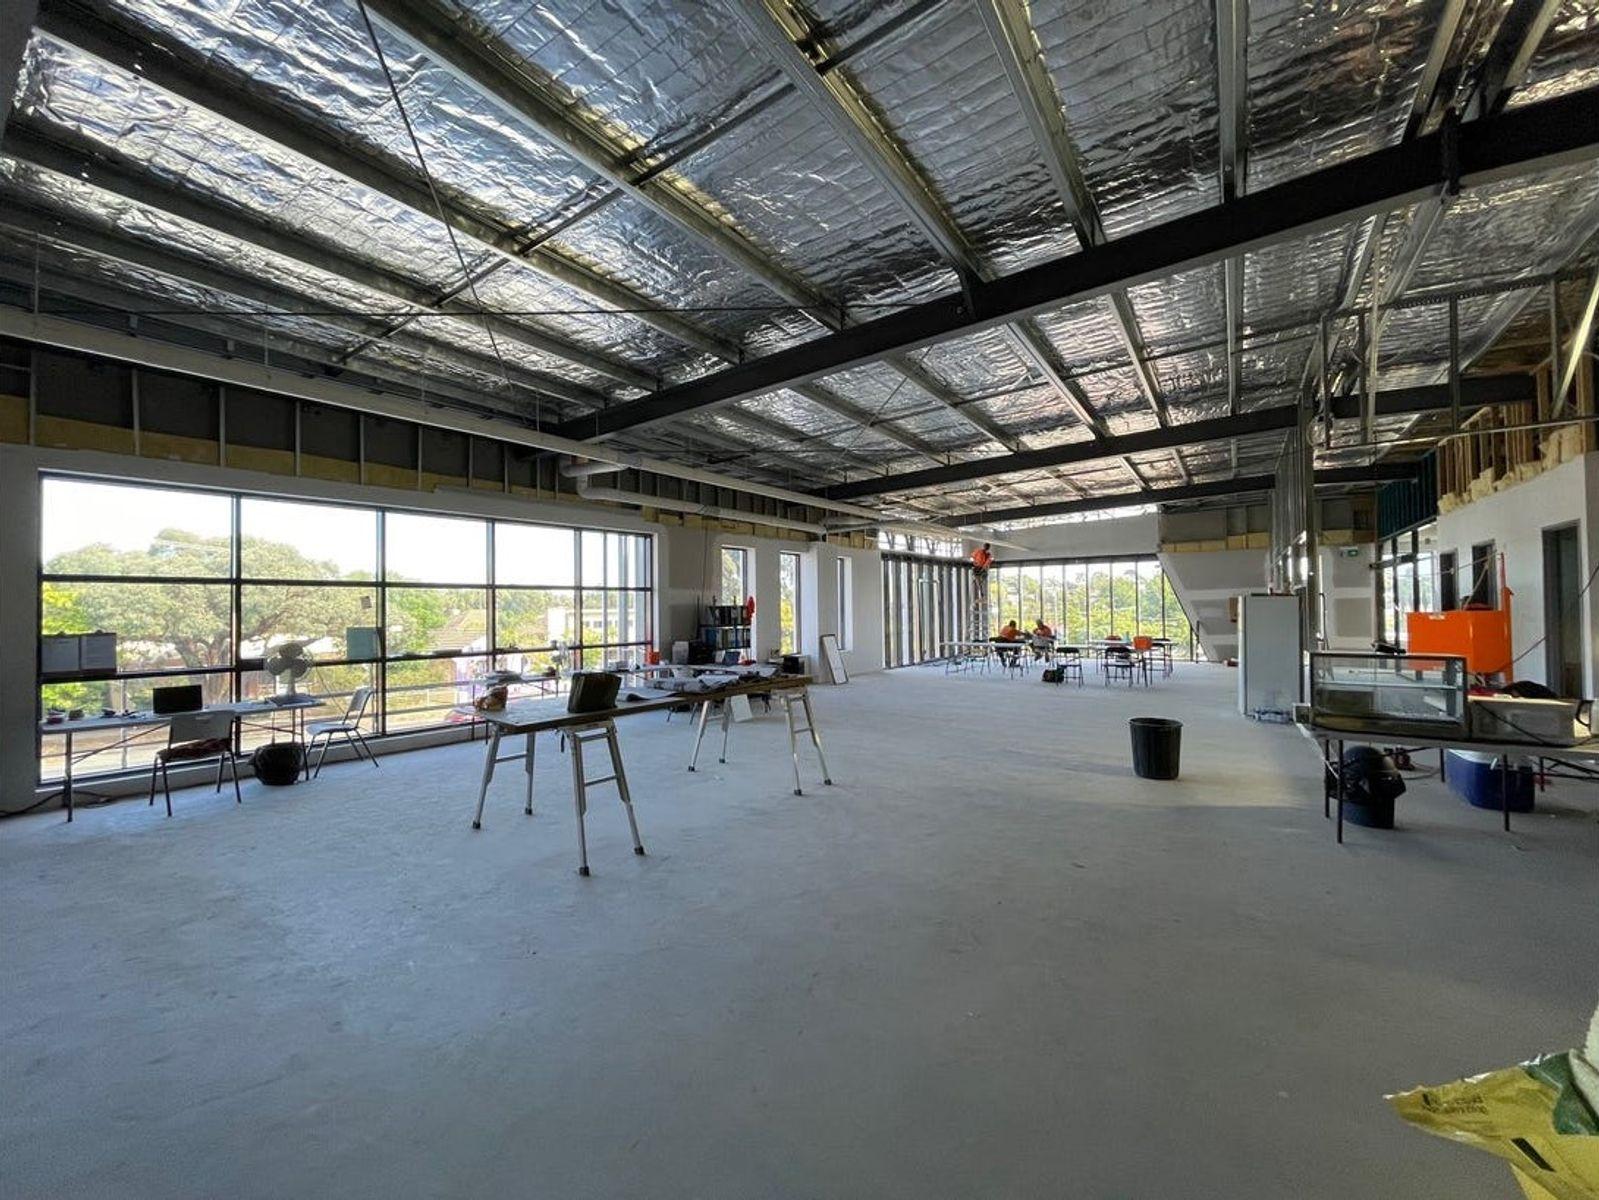 162-170 Eaglehawk Road, Bendigo, VIC 3550